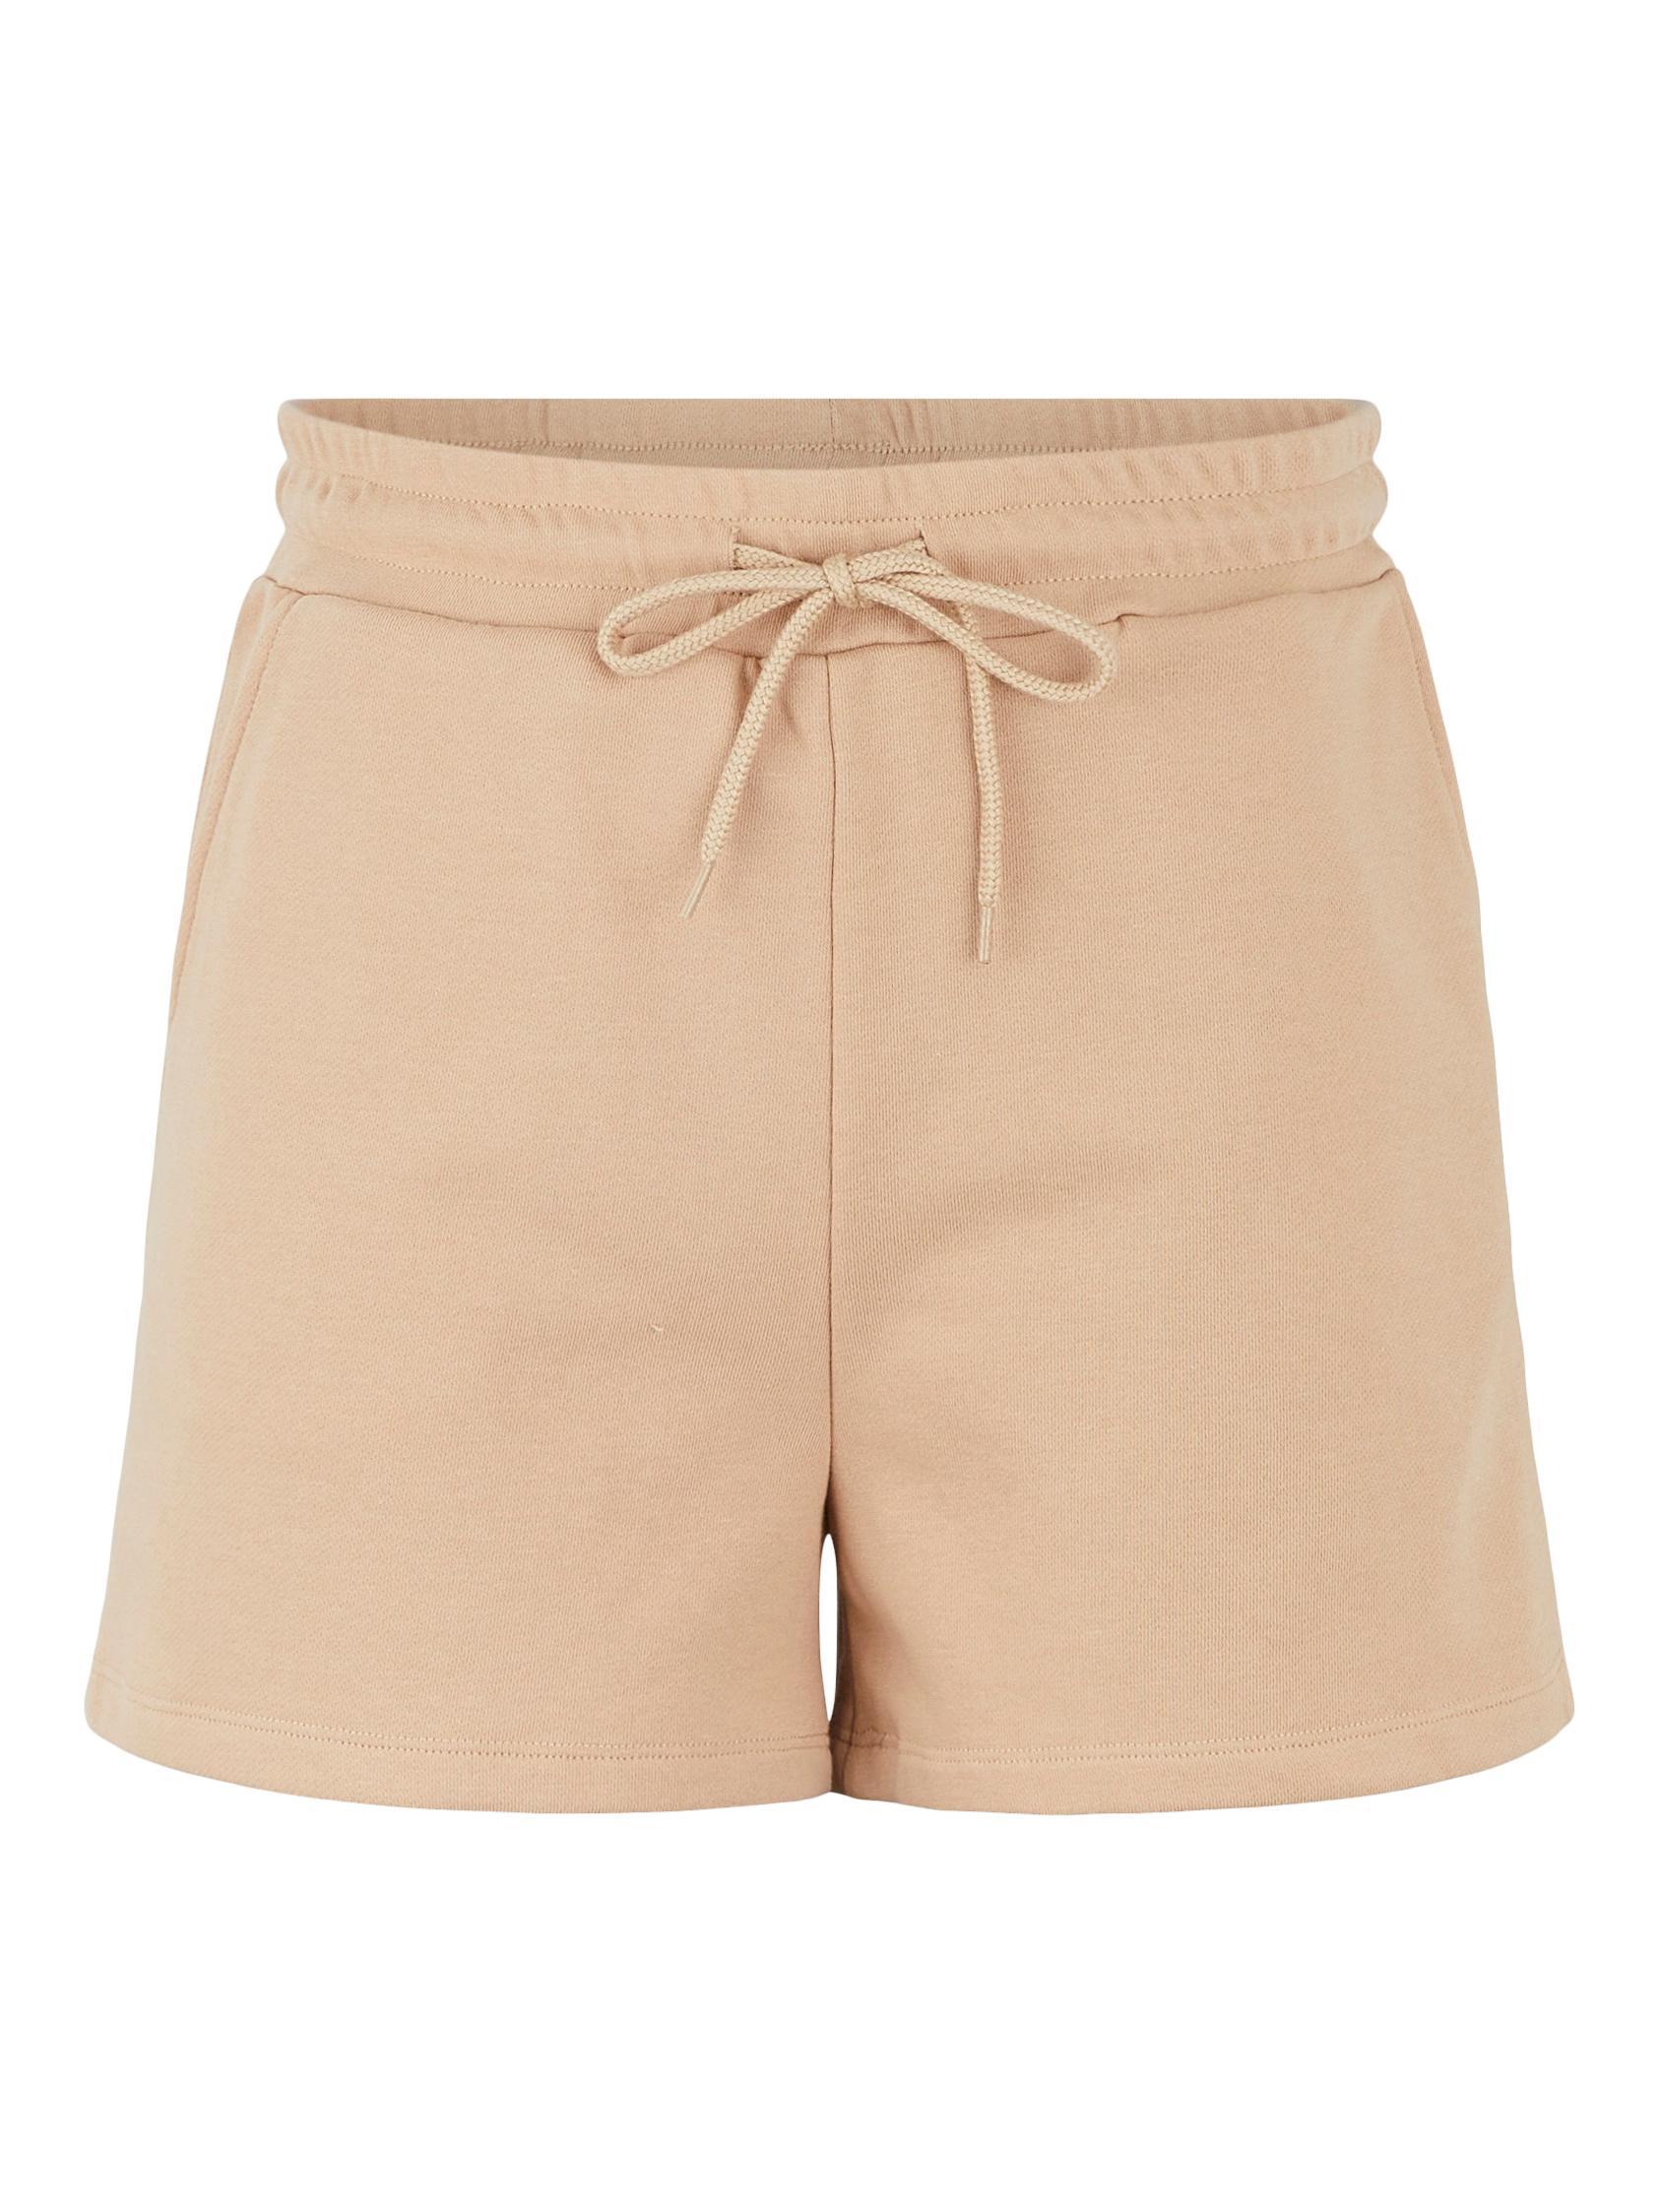 Pieces Chilli Summer shorts, cuban sand, medium